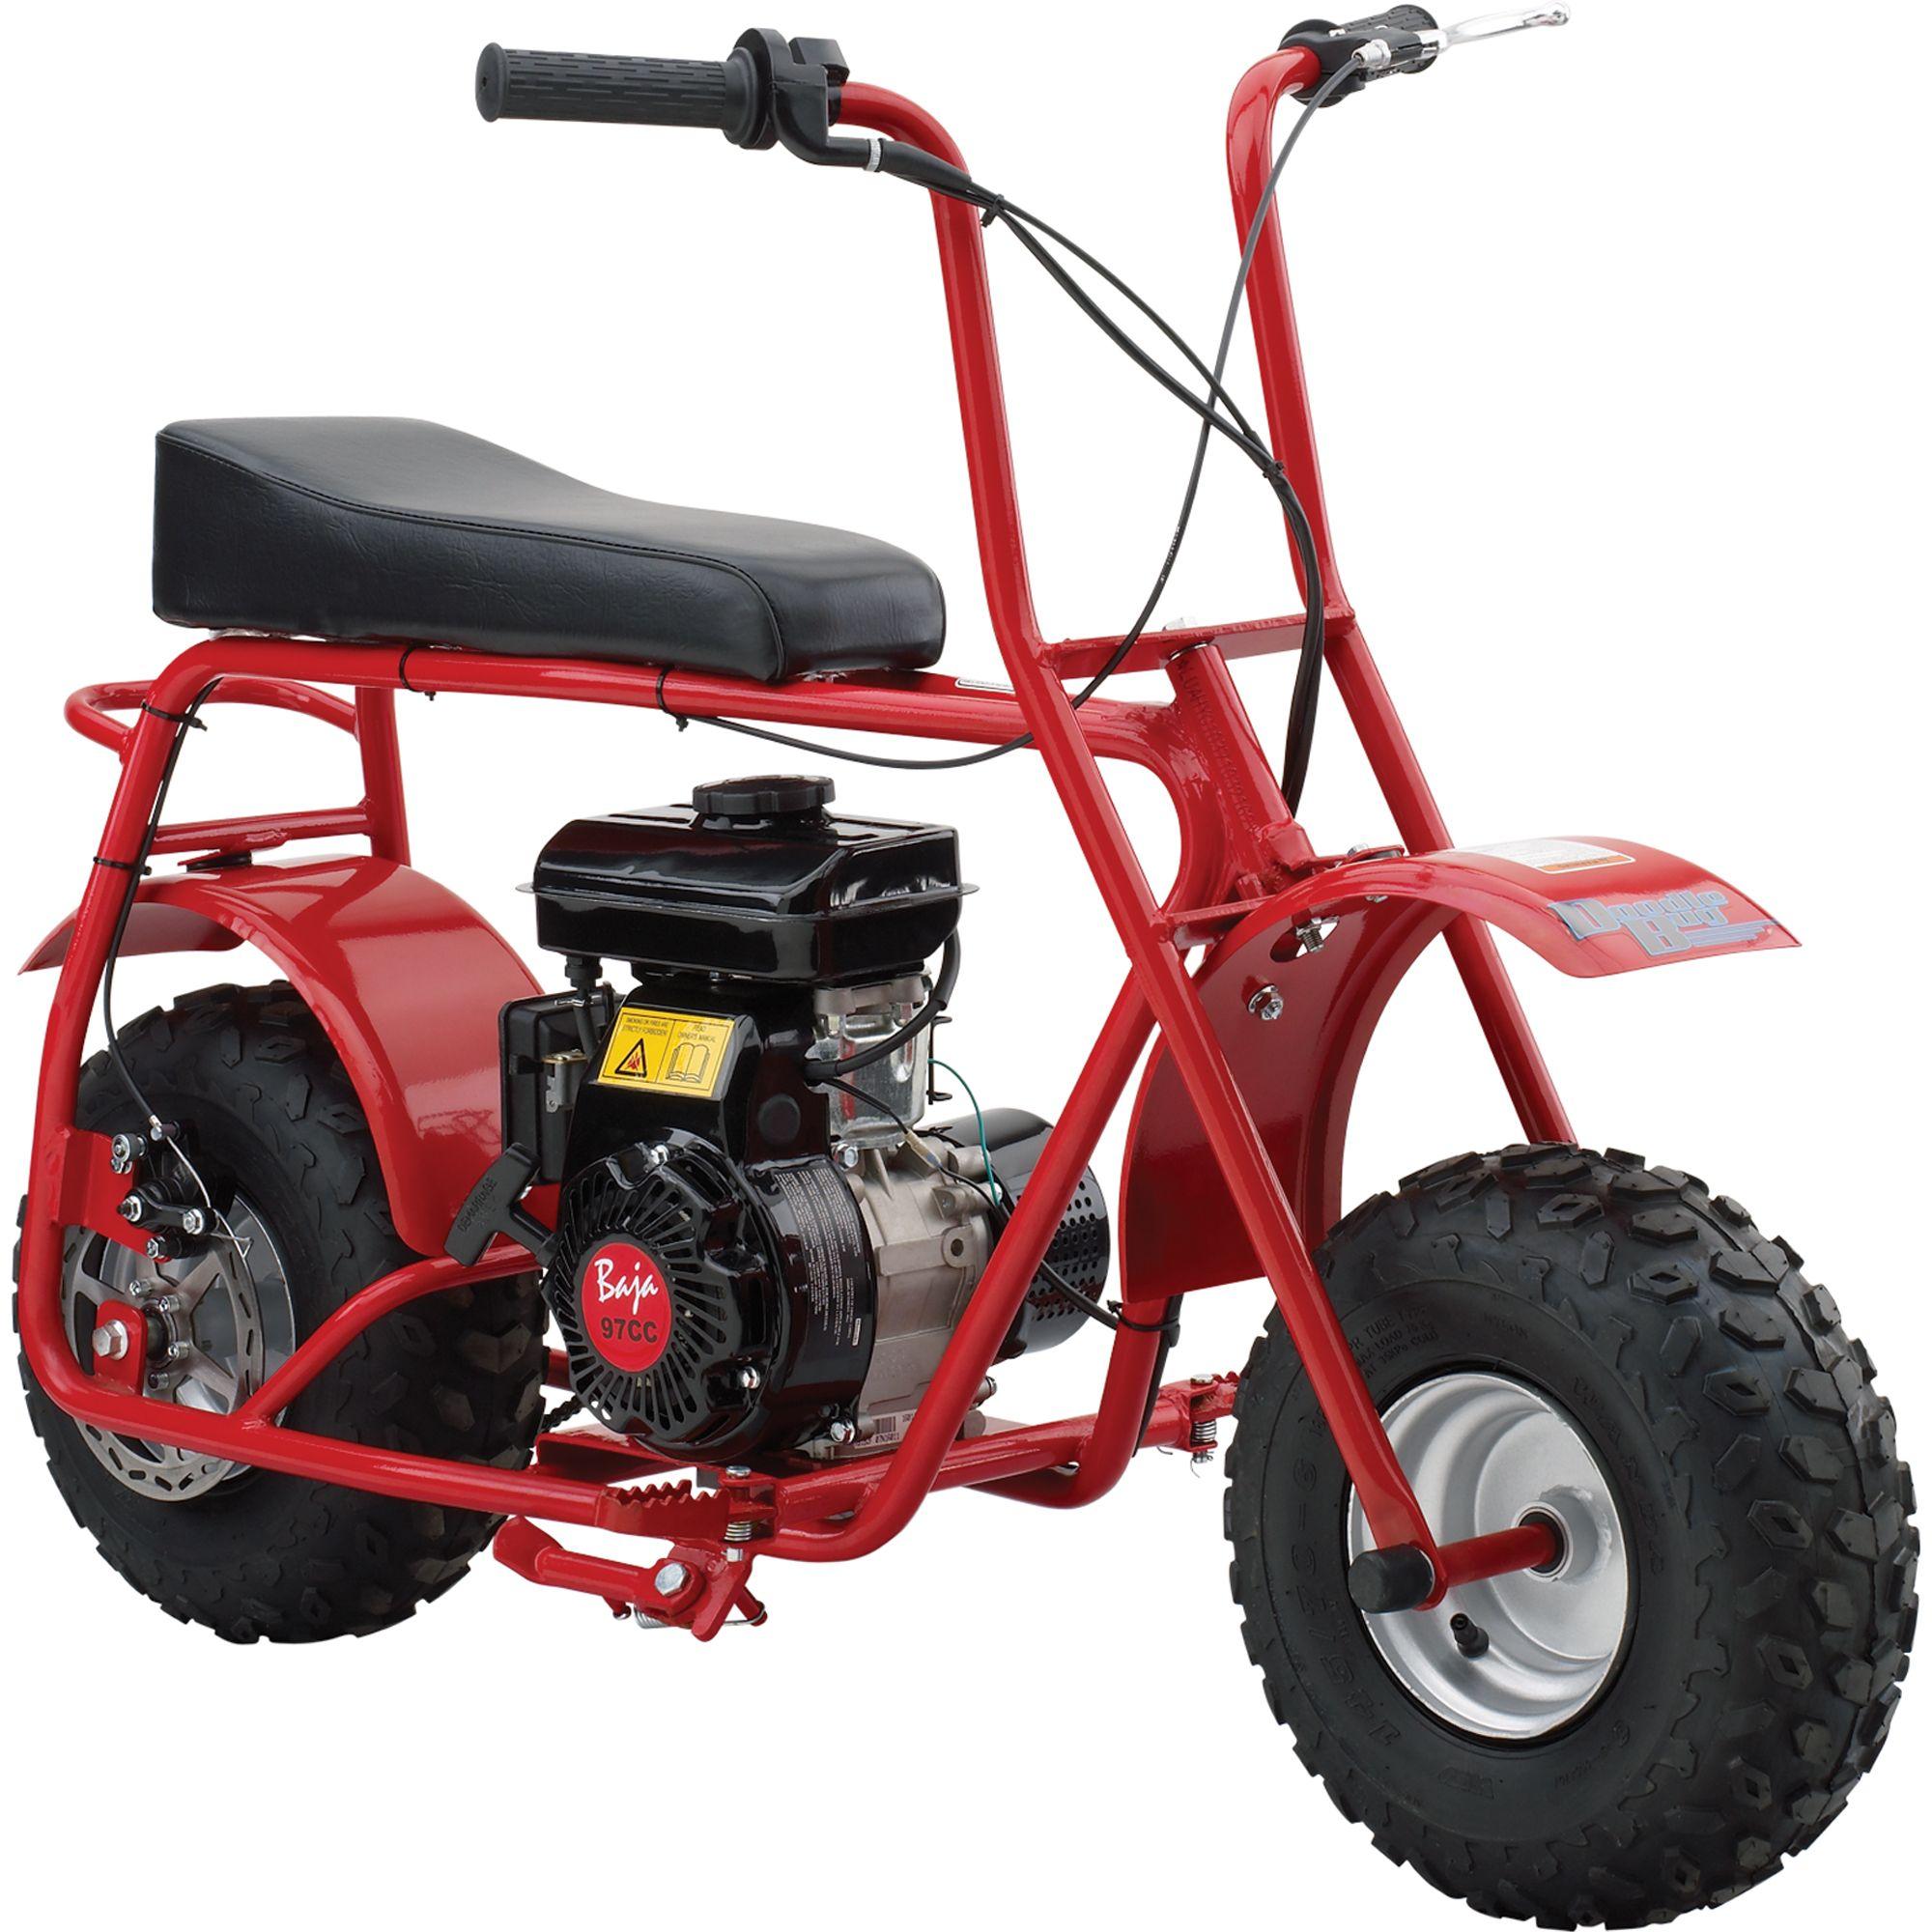 Baja Doodle Bug Mini Bike 97cc 4 Stroke Engine